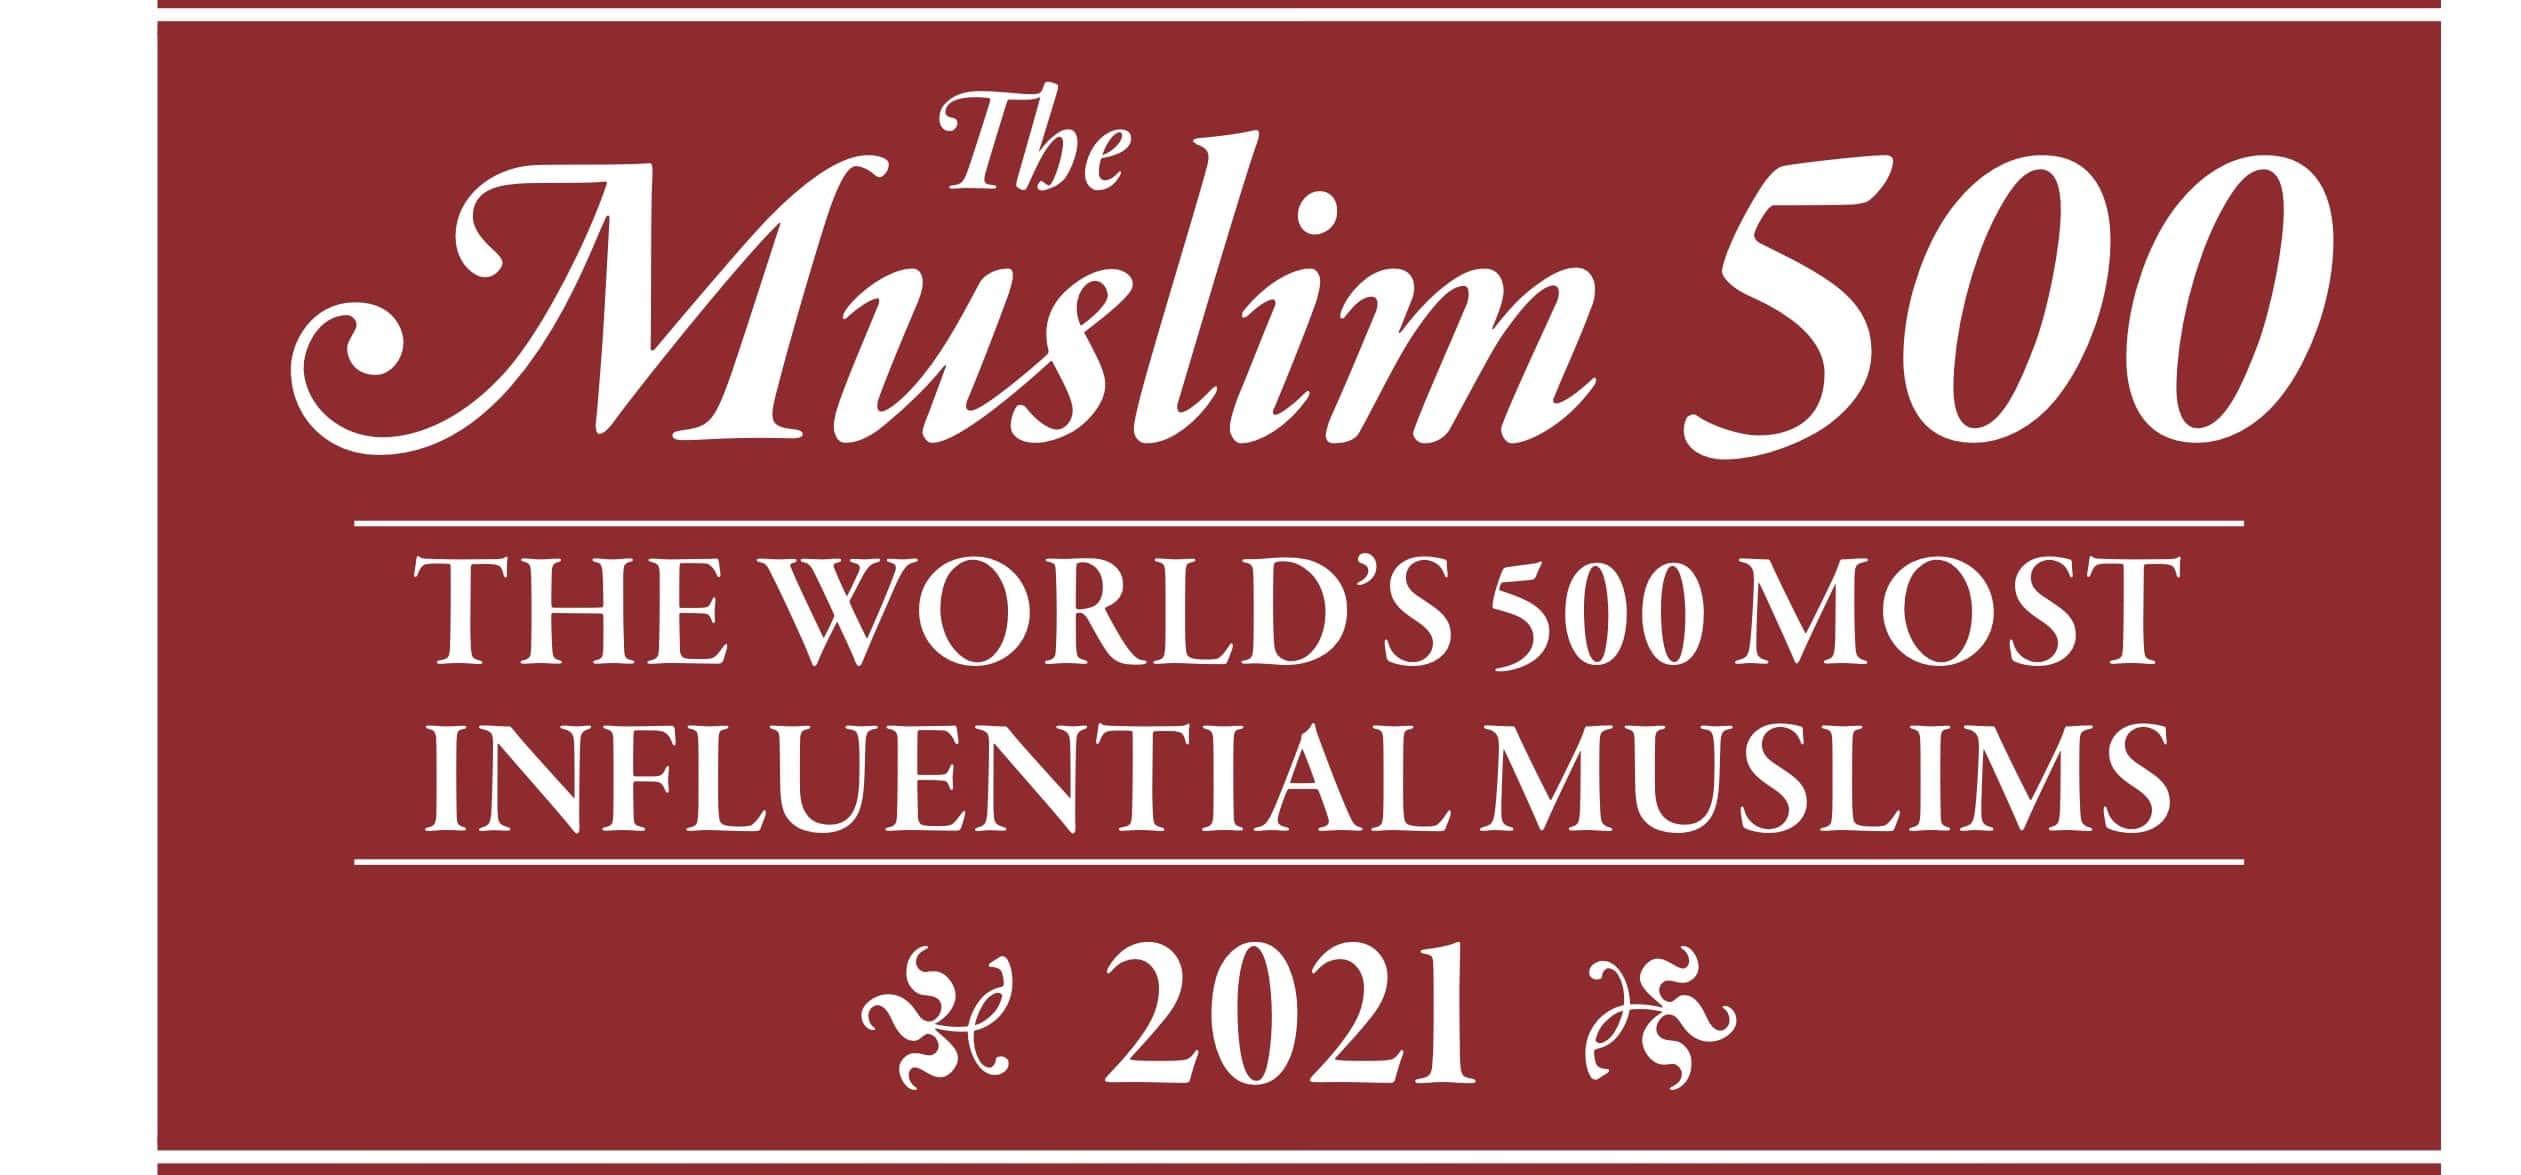 The Muslim 500 - 2021 Edition